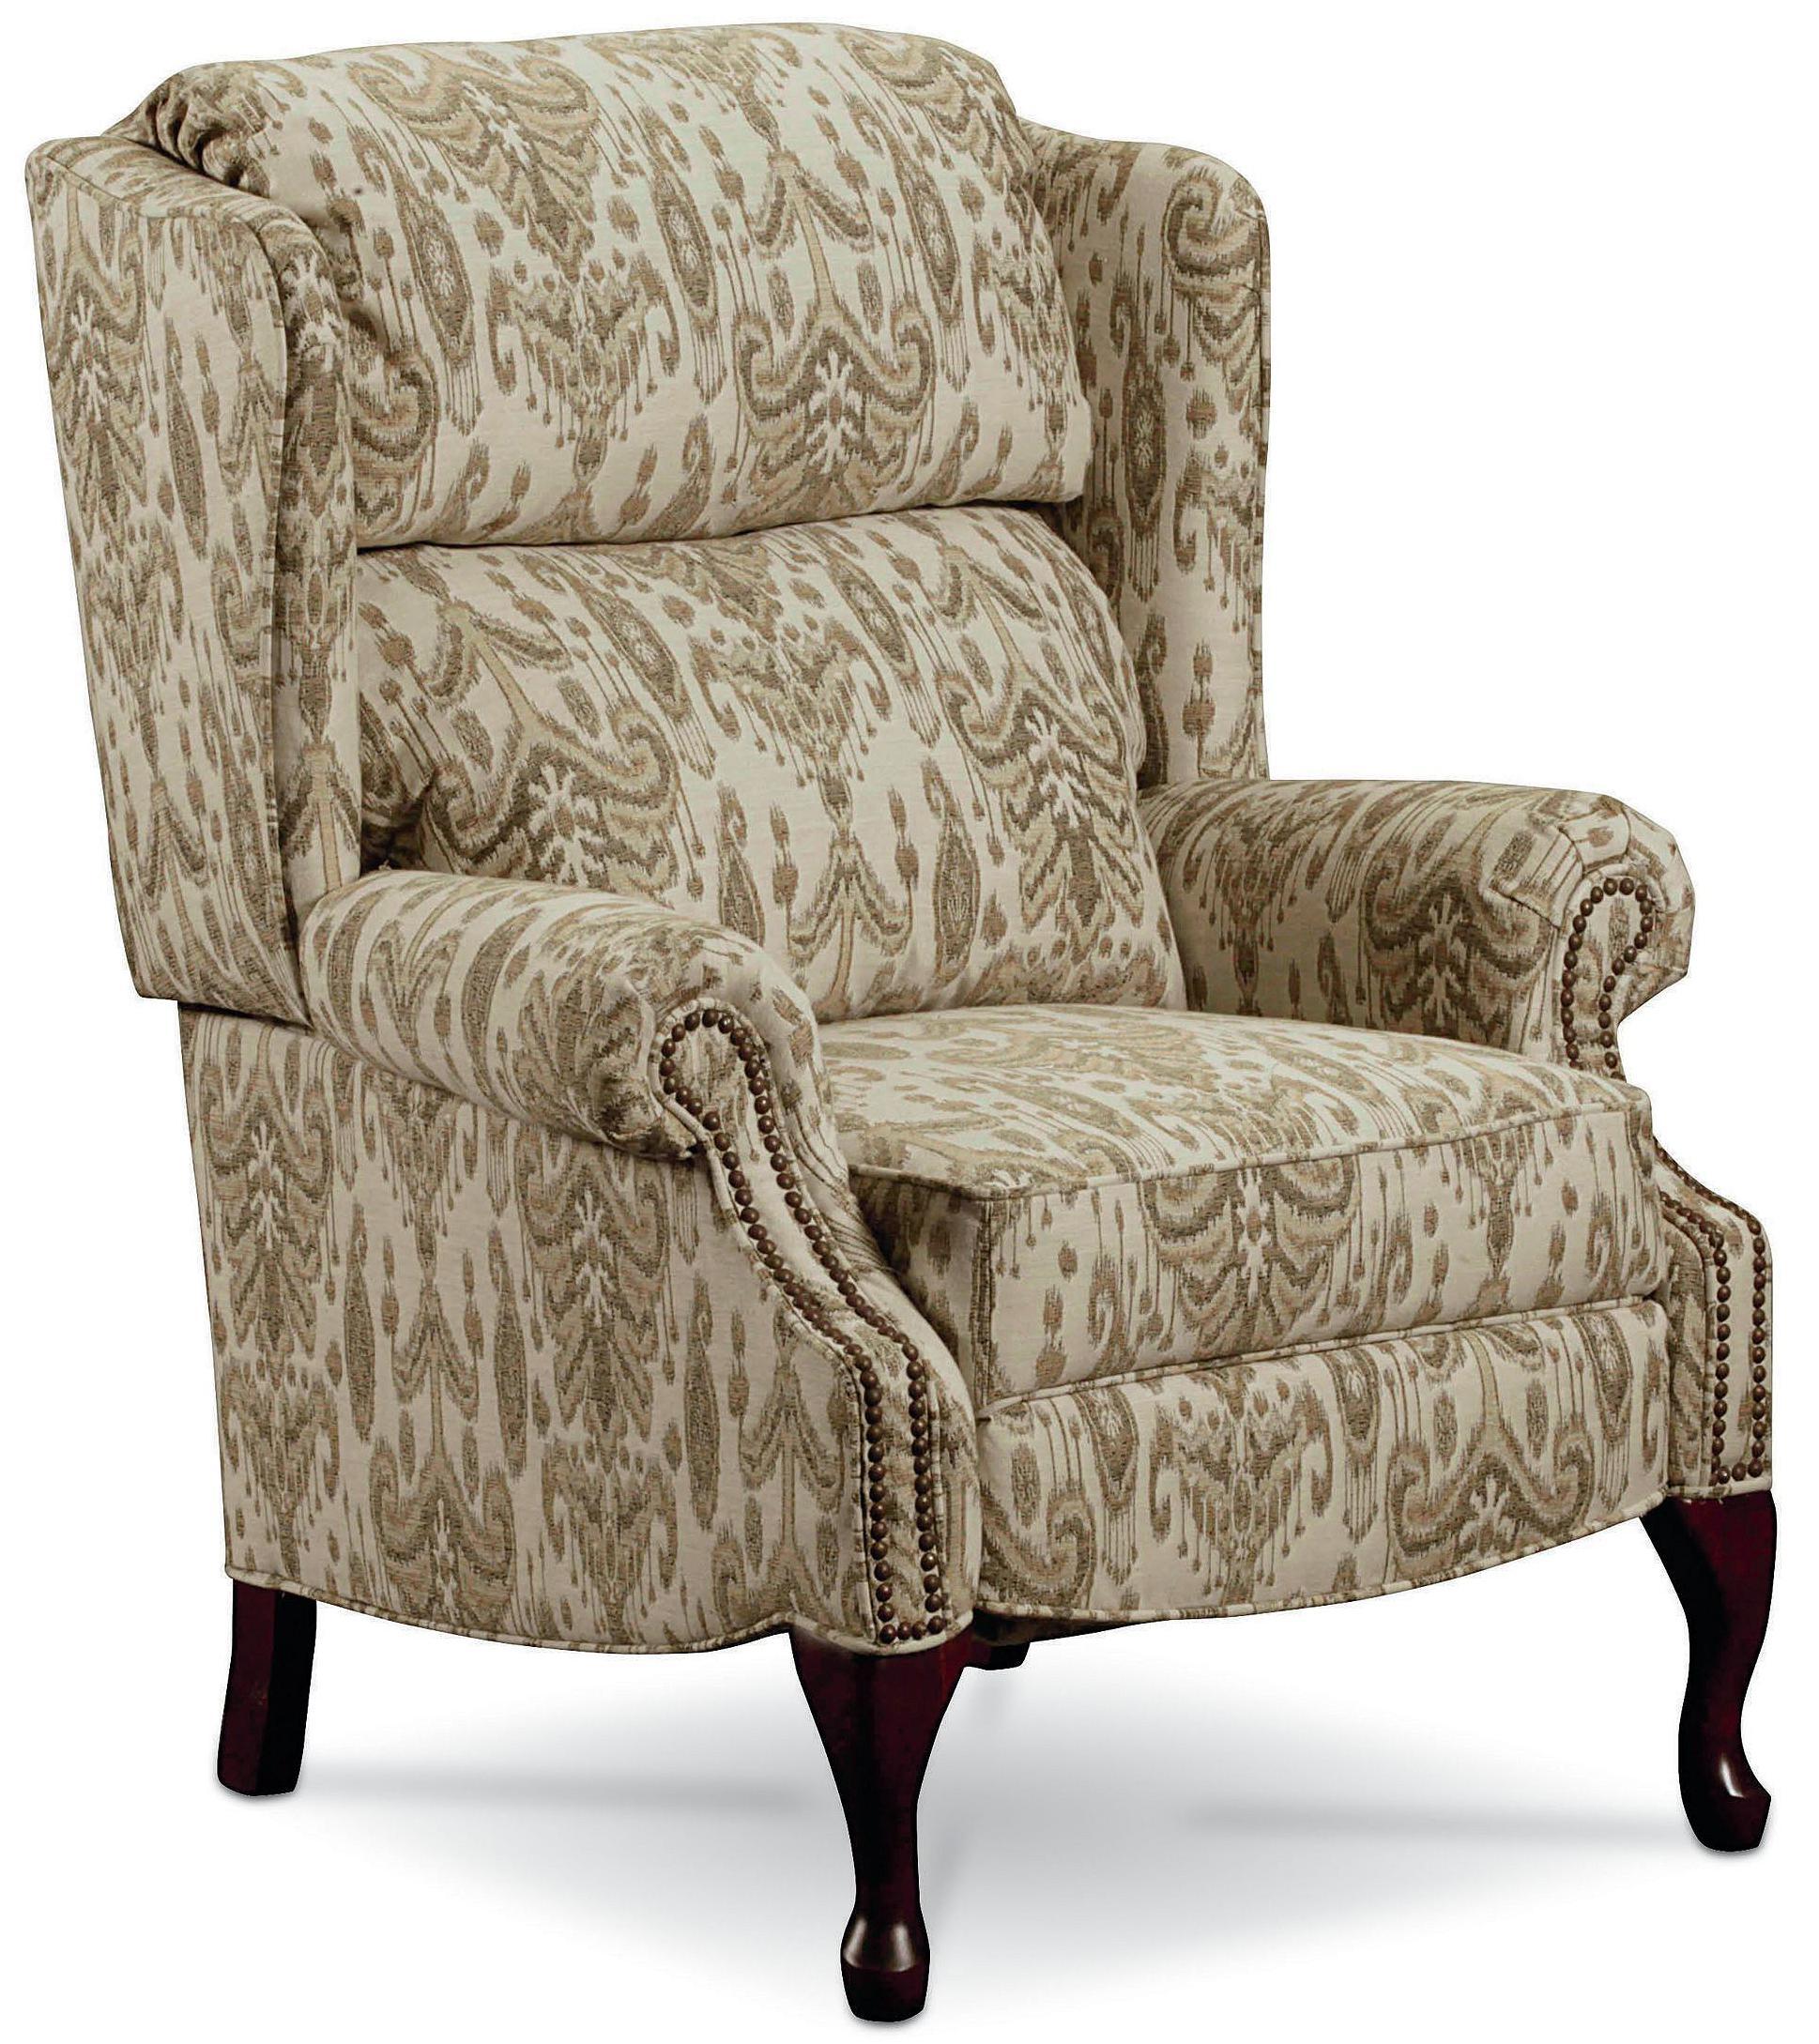 wing back chair recliner kids chairs walmart lane hi leg recliners 2530 savannah high